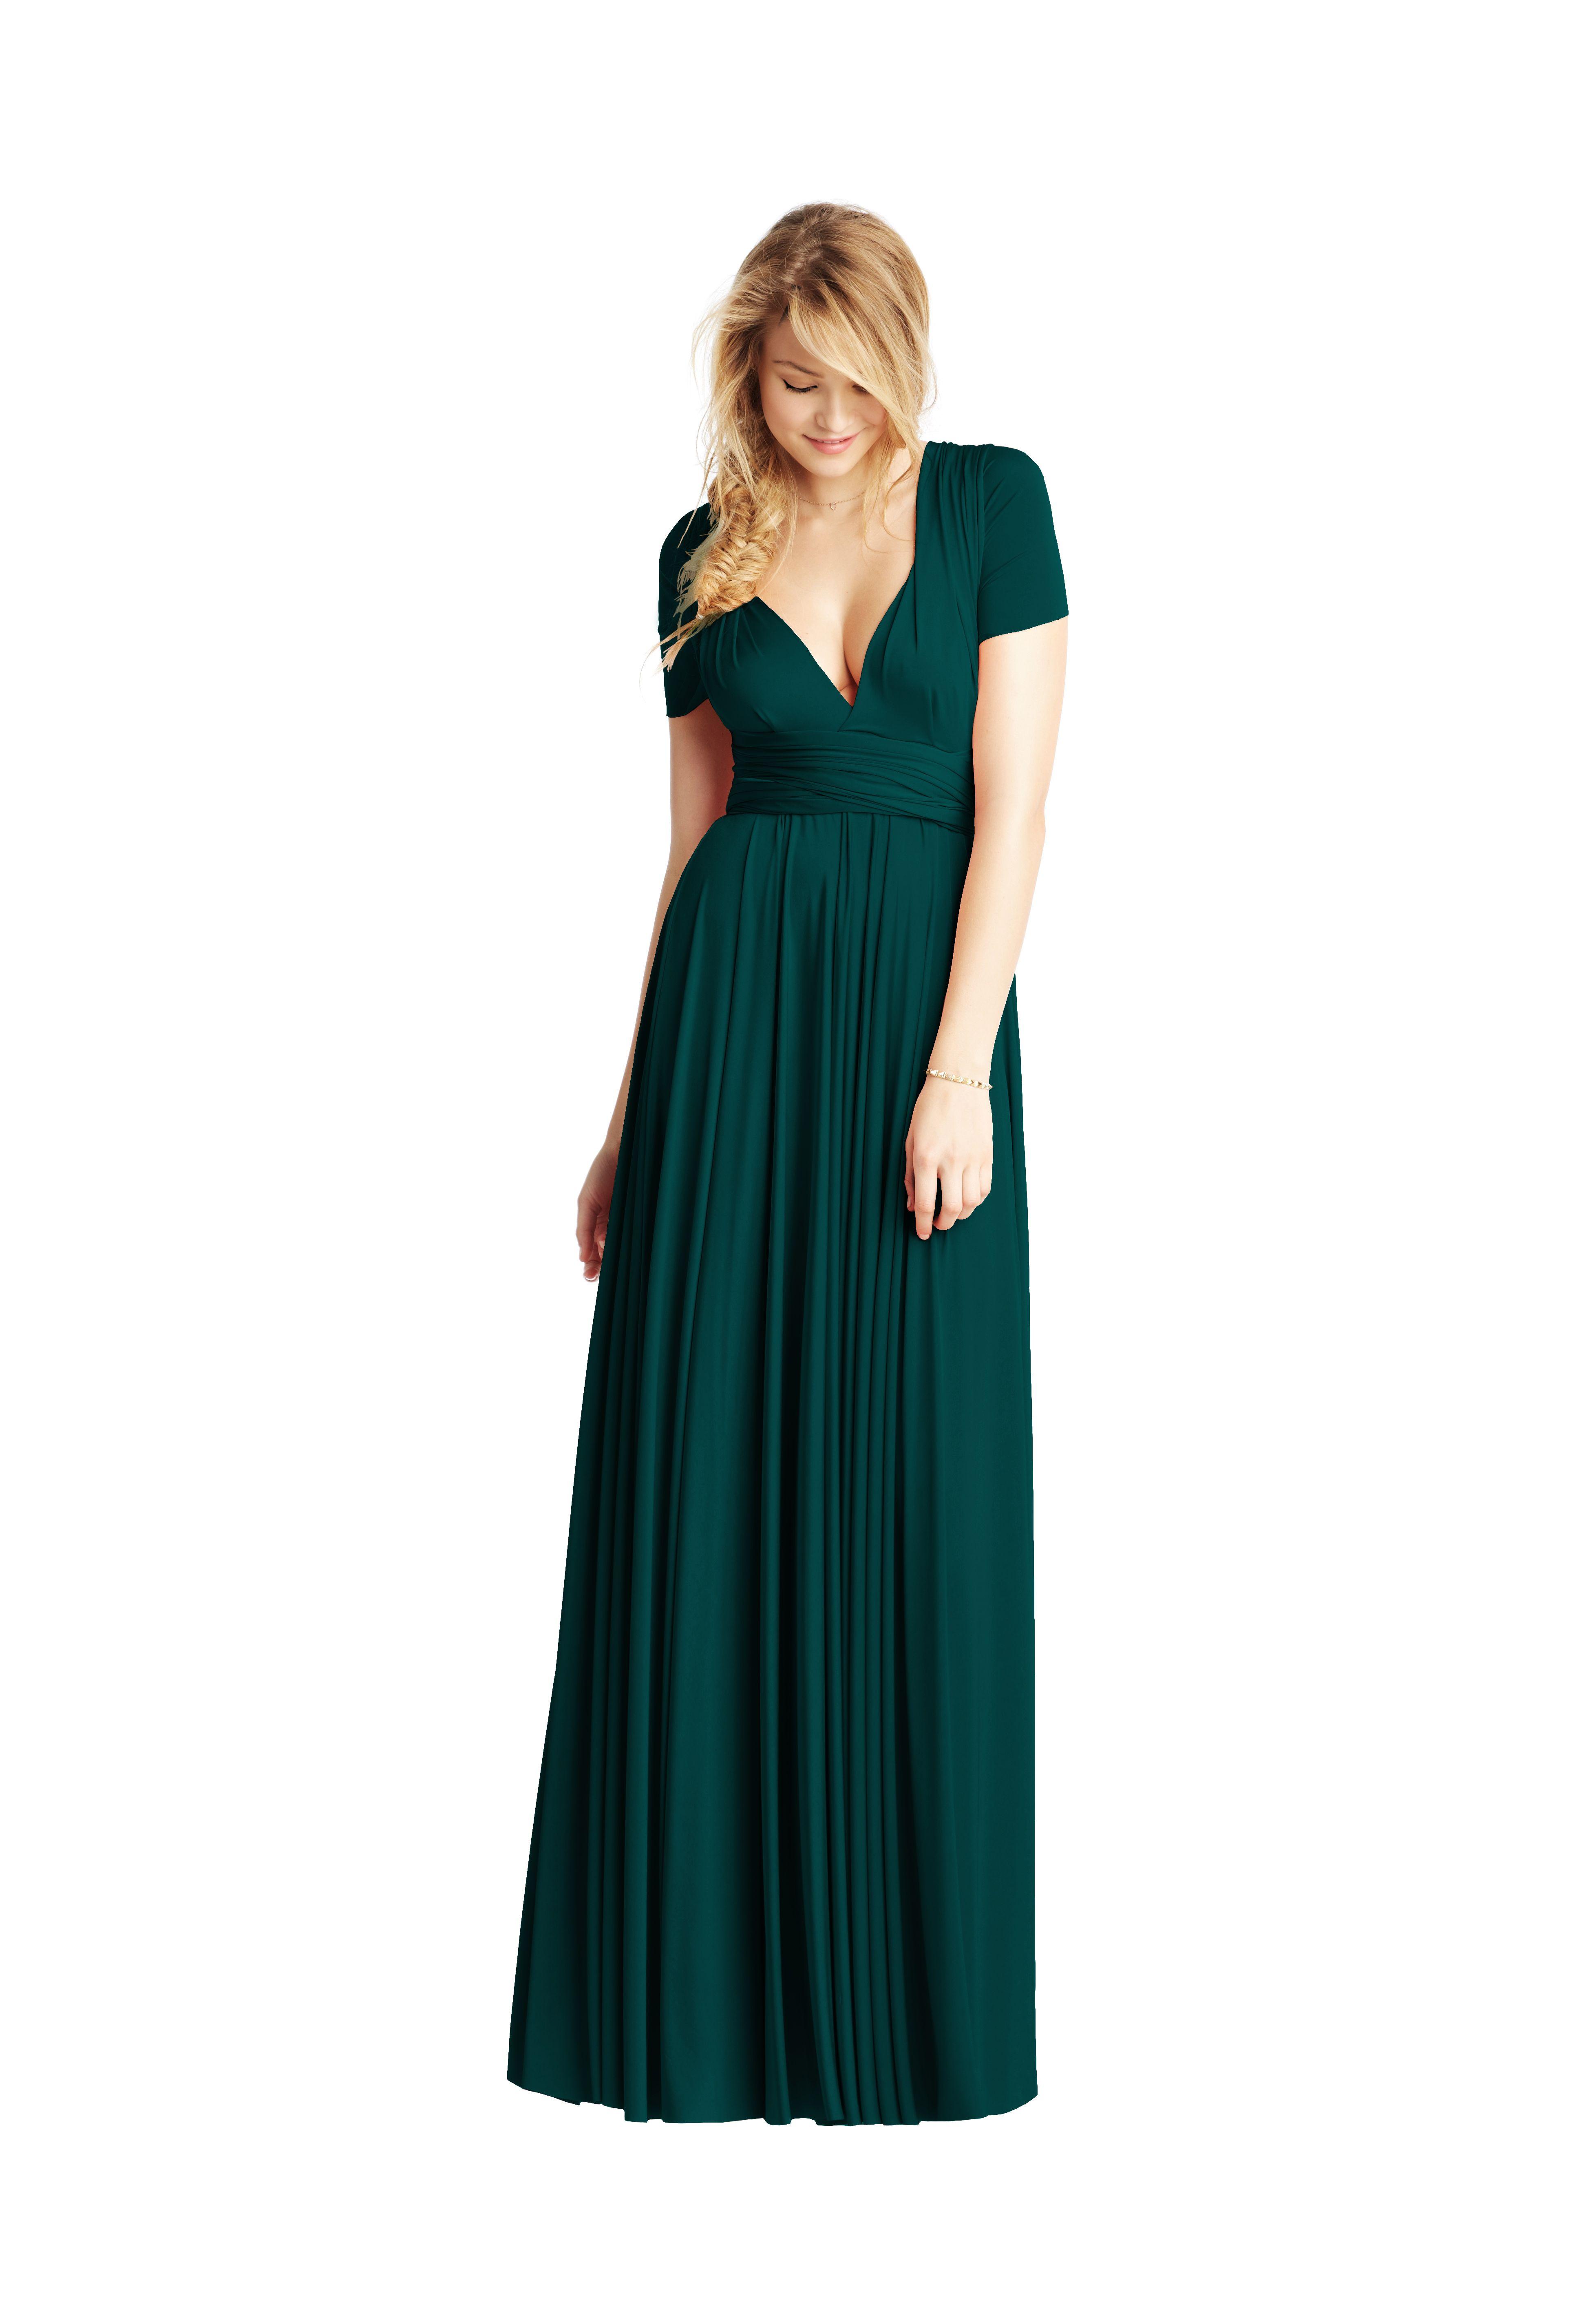 100 dollar wedding dress  Brand New Shades From TwoBirds Bridesmaid  Wedding inspiration Cap